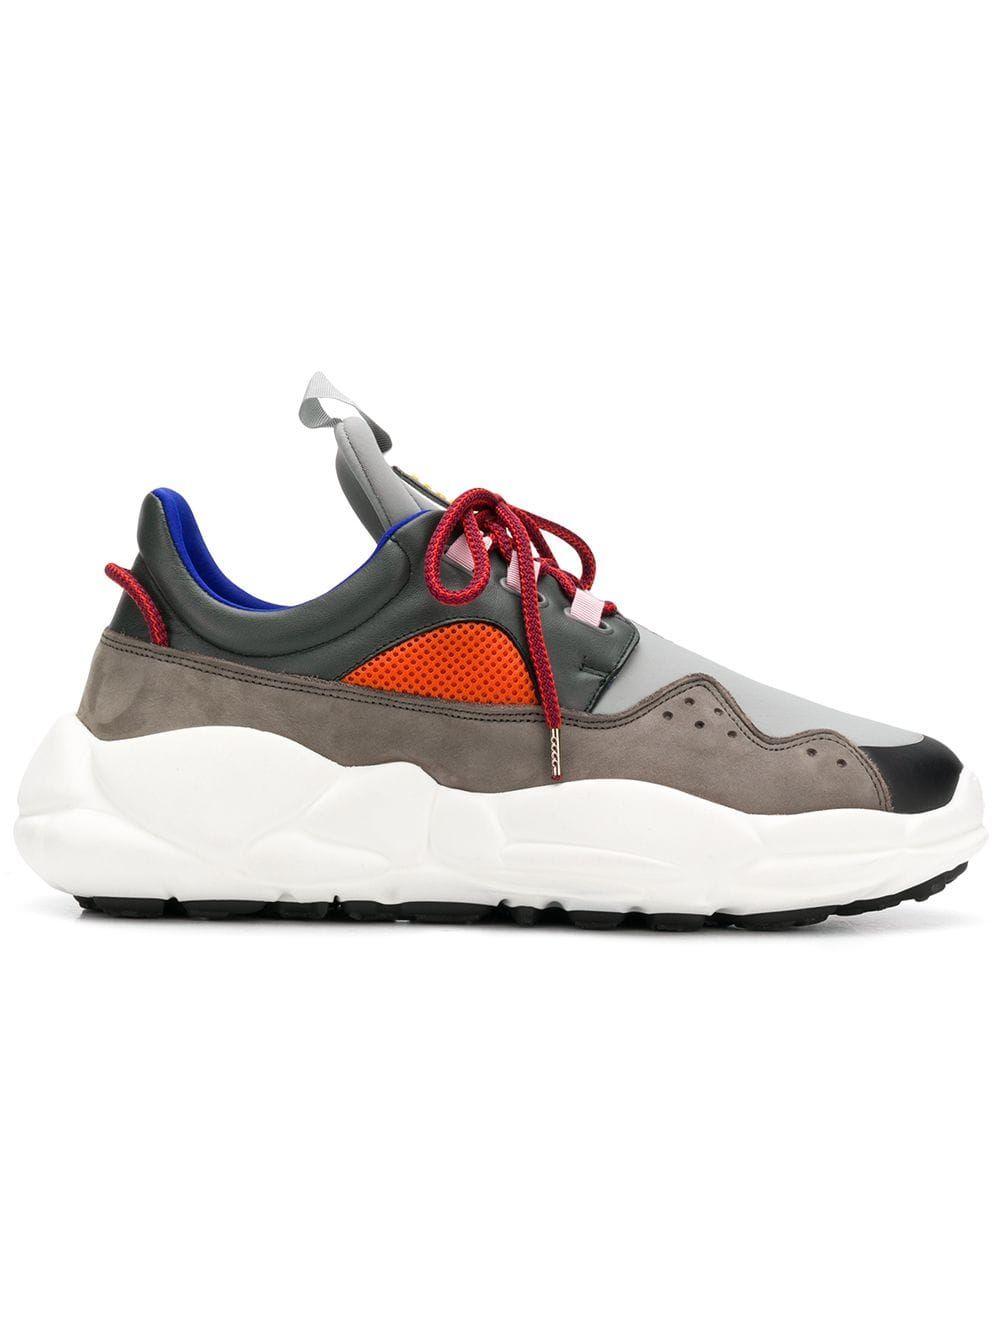 size 40 c821f 1e08a VERSUS VERSUS VERSUS - MAN - RUNNING - GREY. versus shoes